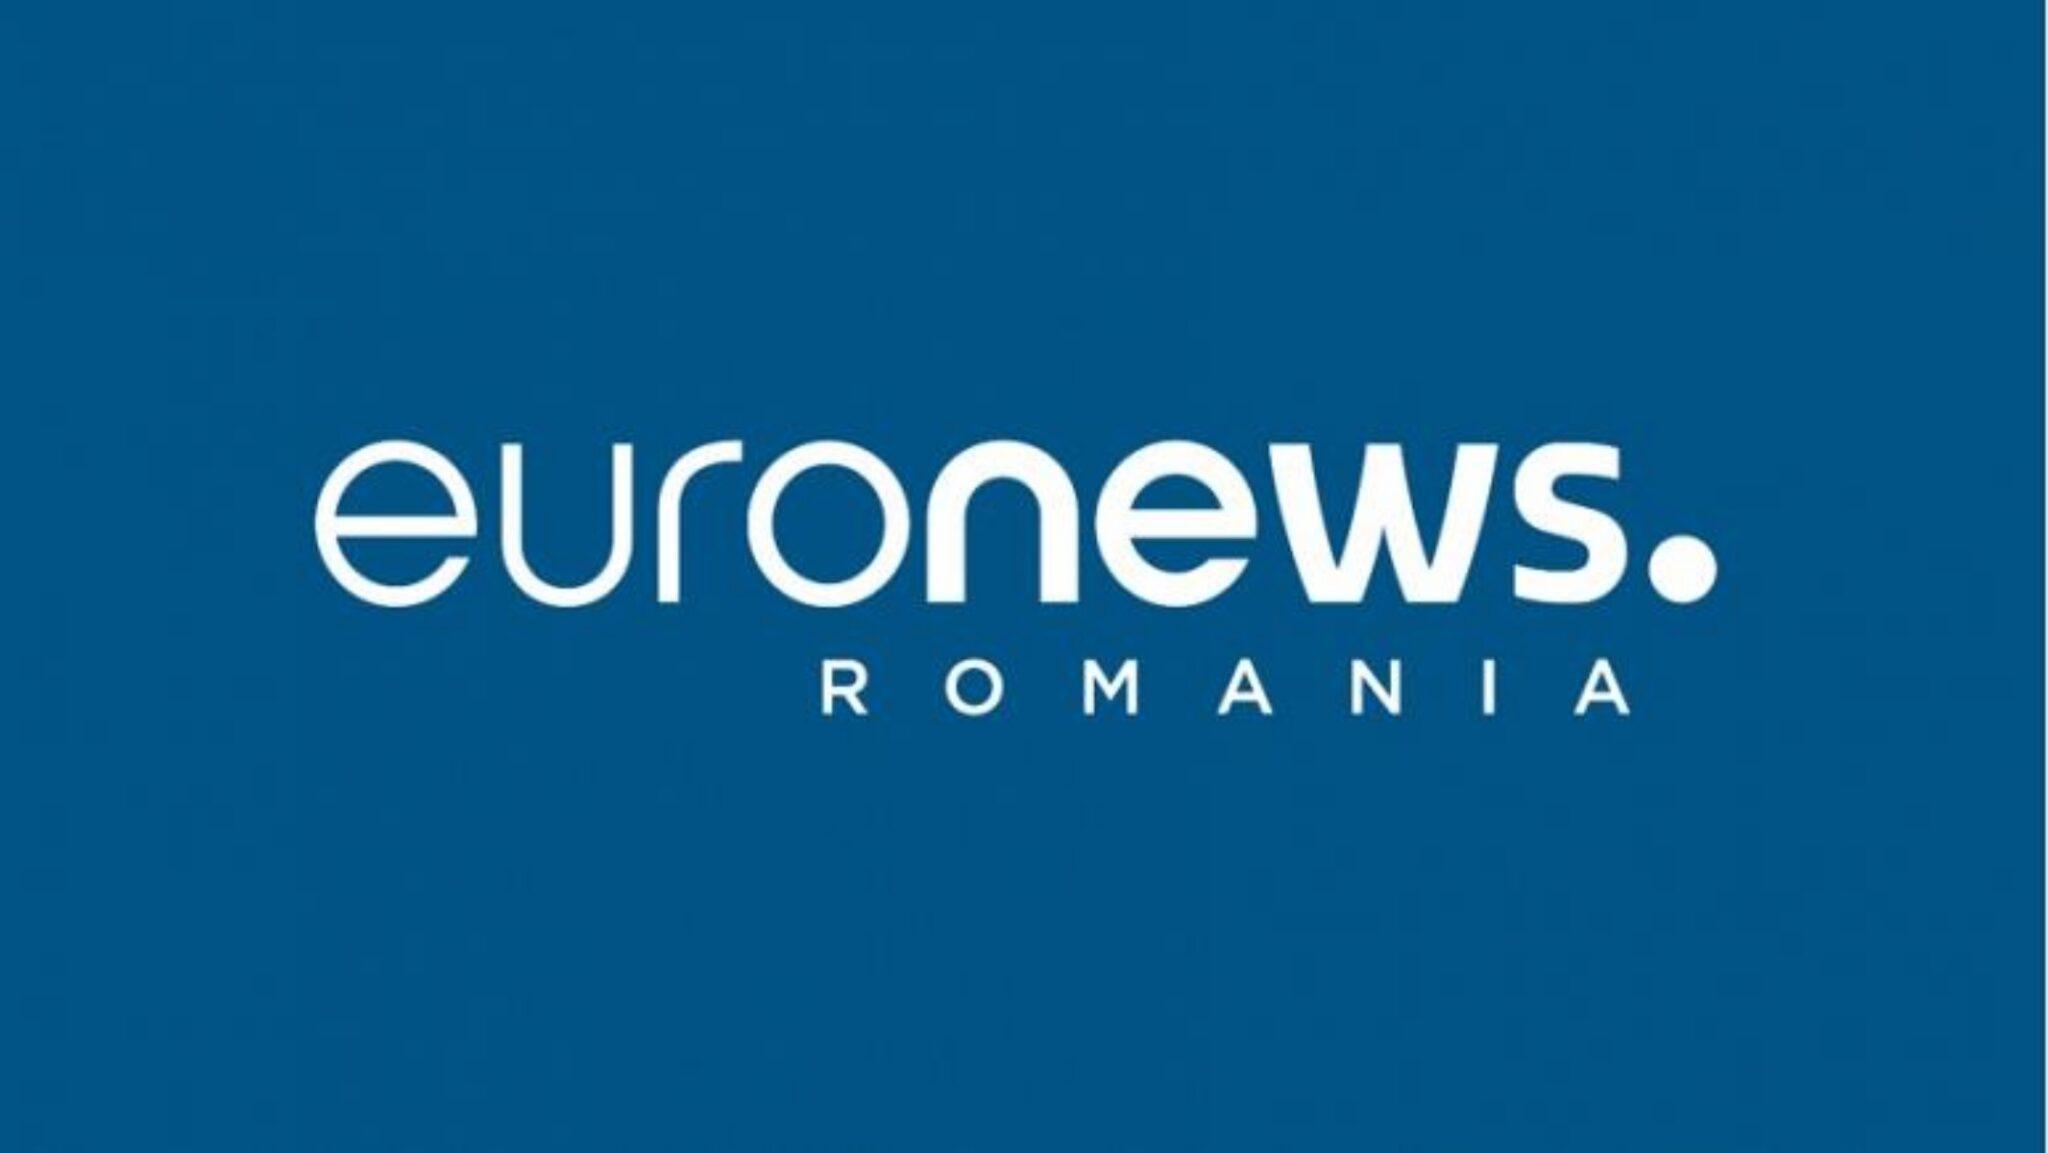 Euronews Romania / Euronews Румыния